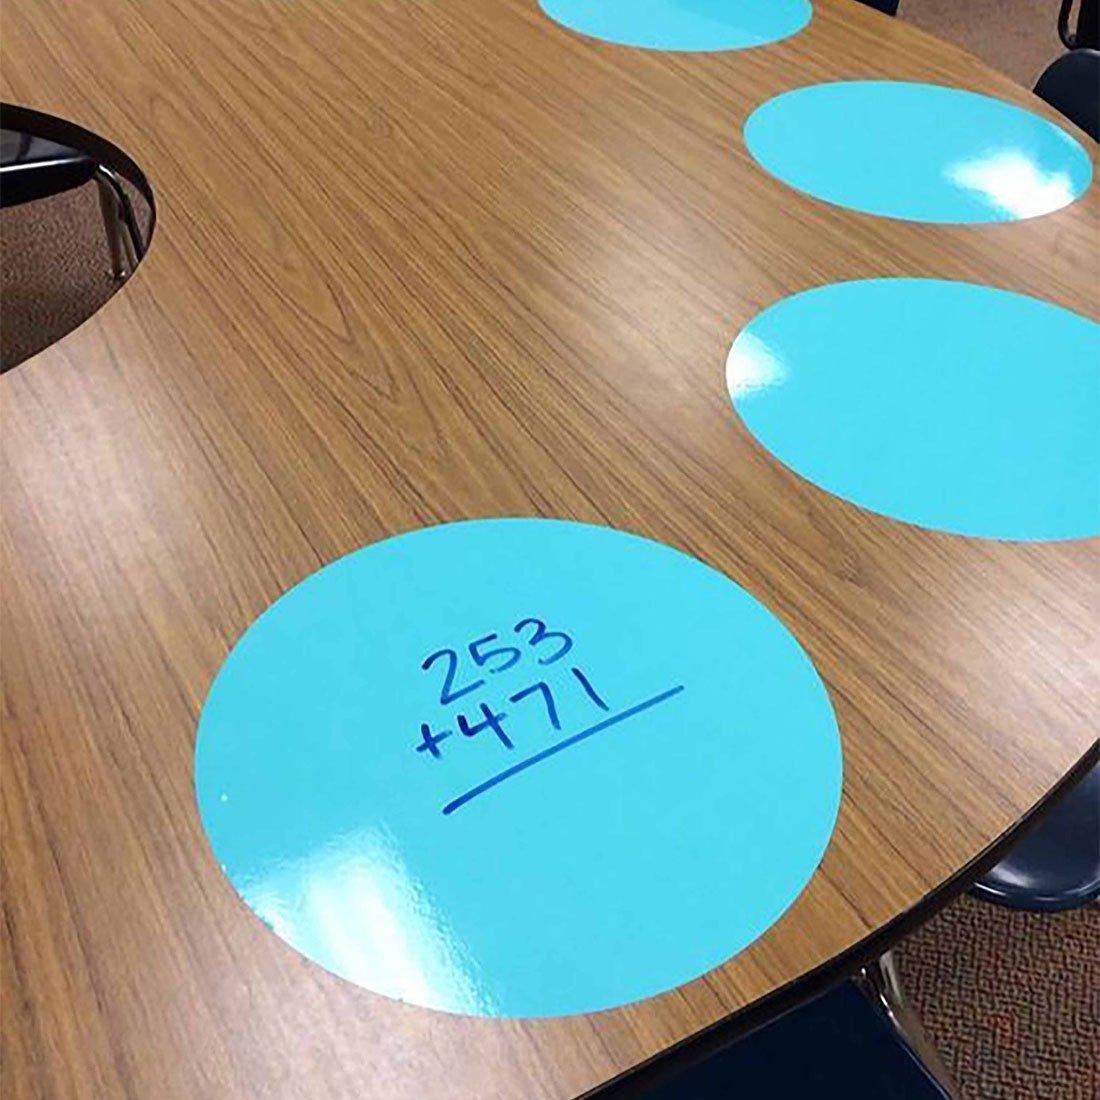 math-problems-written-on-blue-place-mats-on-table.jpg